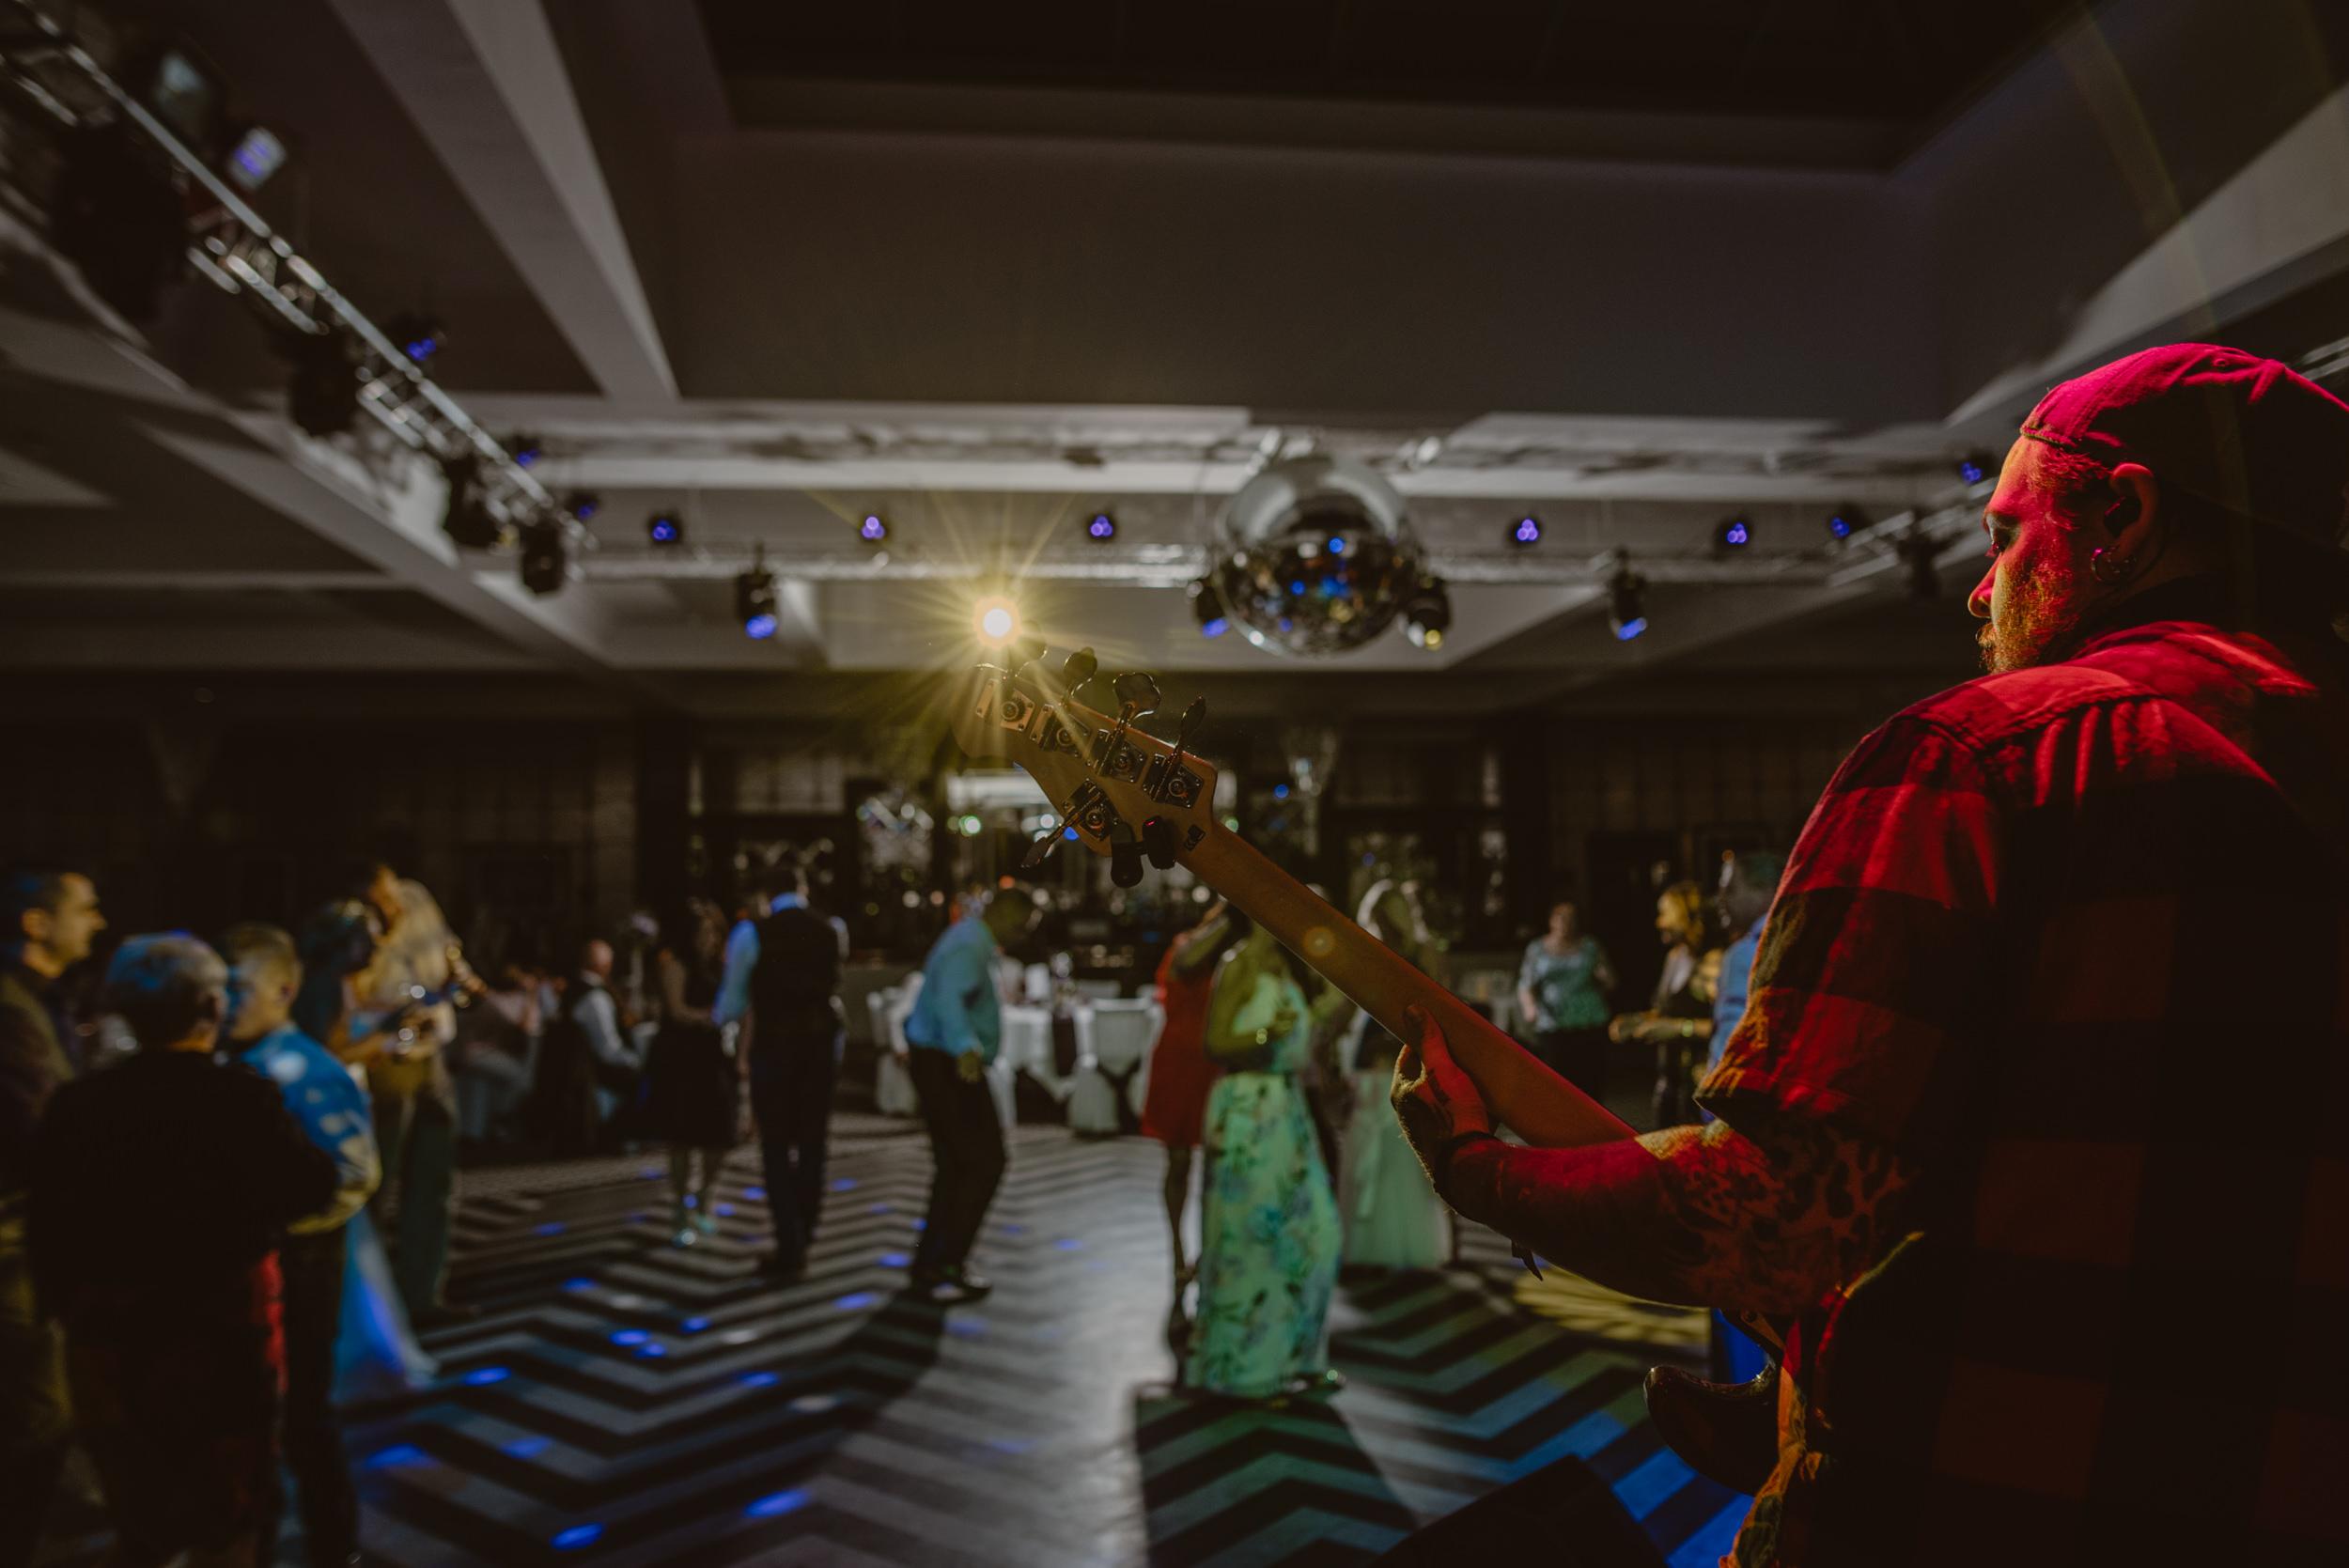 Chantelle-and-Stephen-Old-Thorns-Hotel-Wedding-Liphook-Manu-Mendoza-Wedding-Photography-615.jpg